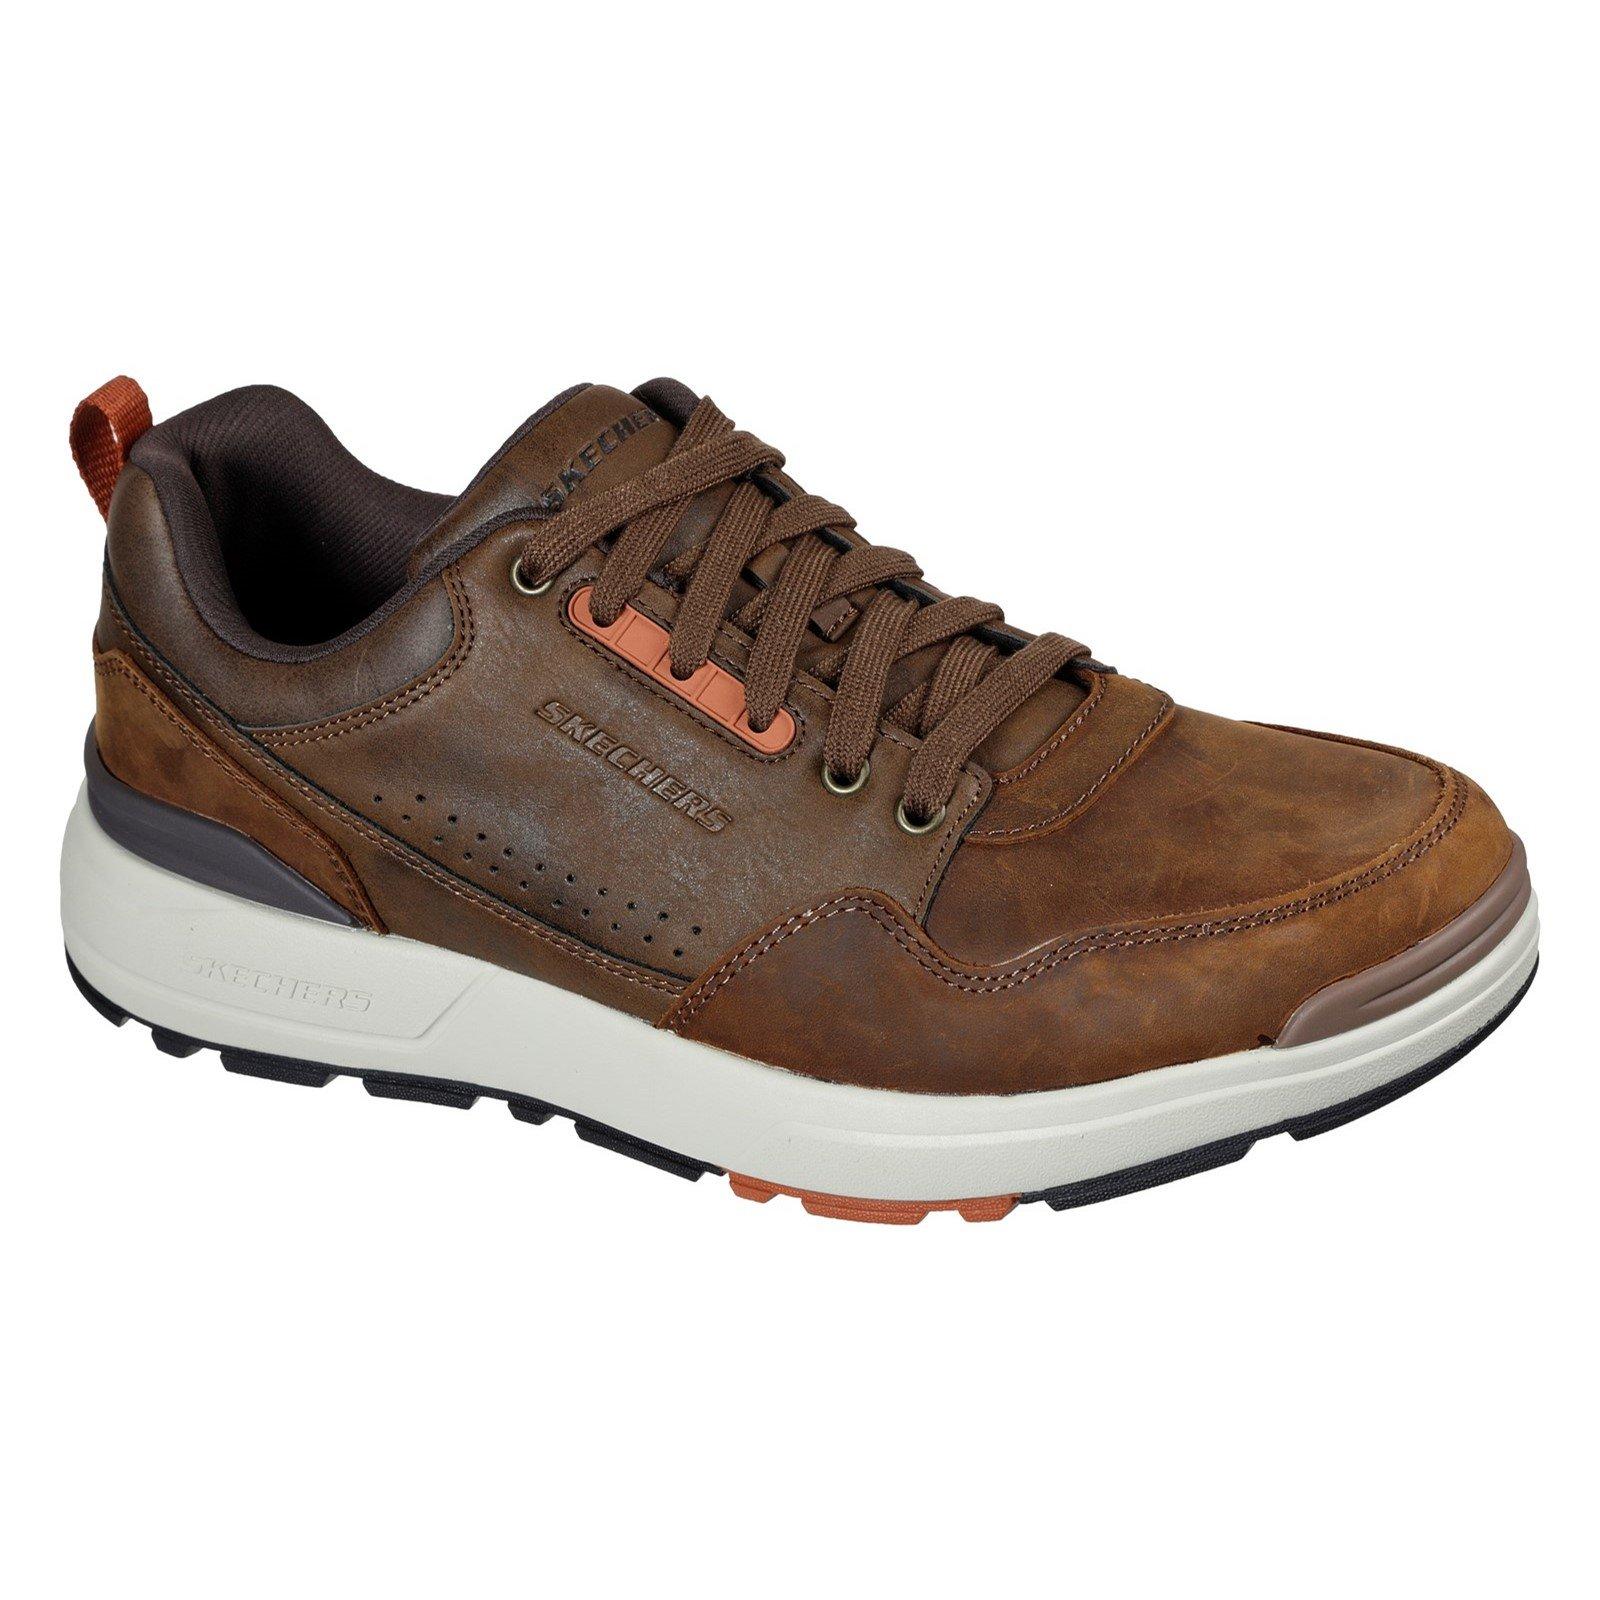 Skechers Men's Rozier Mancer Trainer Multicolor 32450 - Chocolate/Dark Brown 6